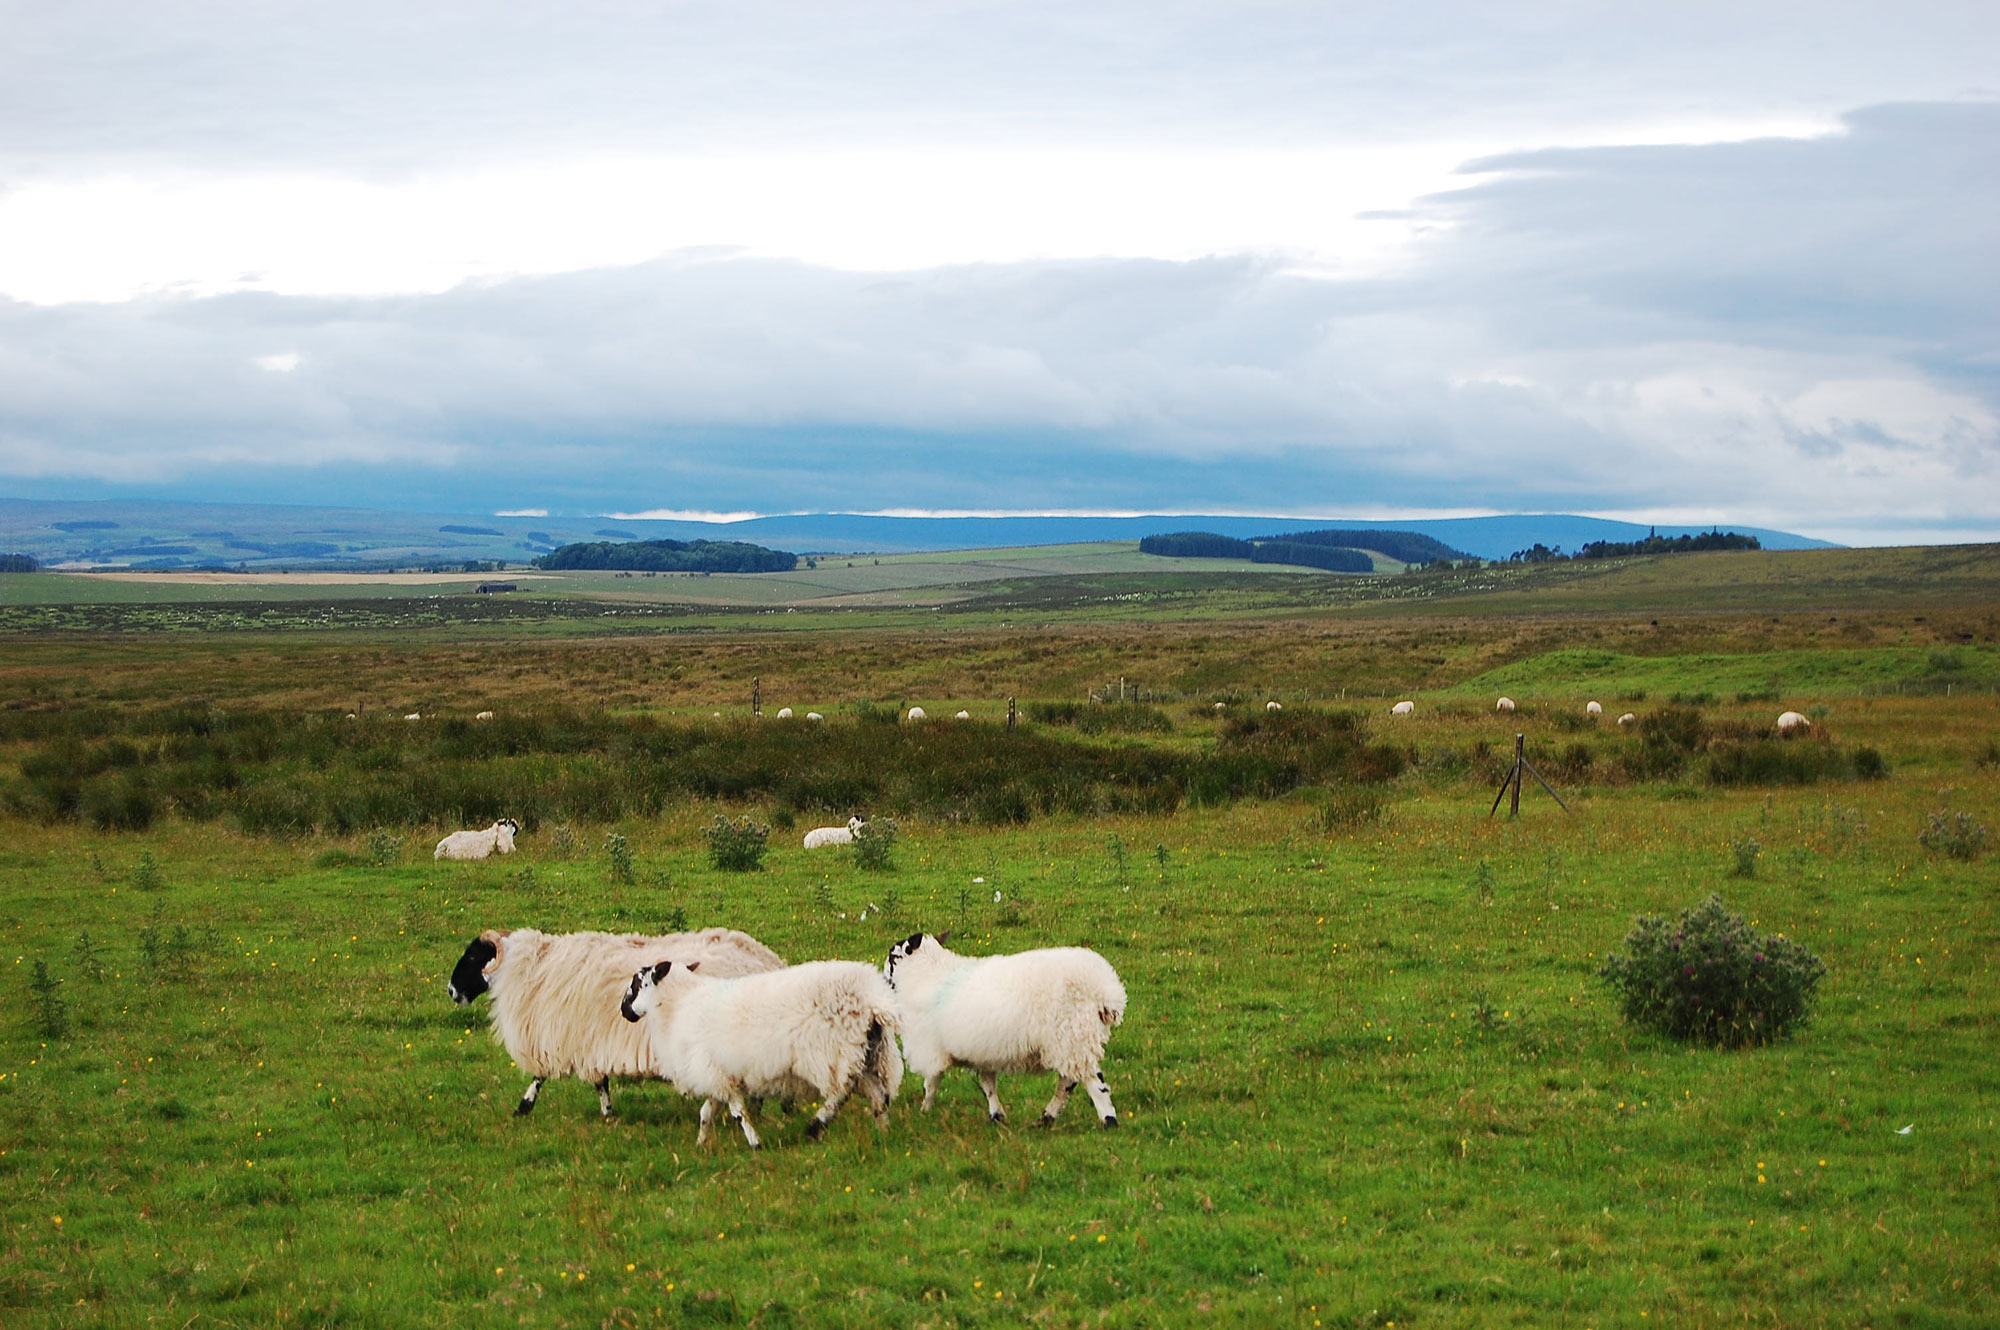 Carrawbrough schapen